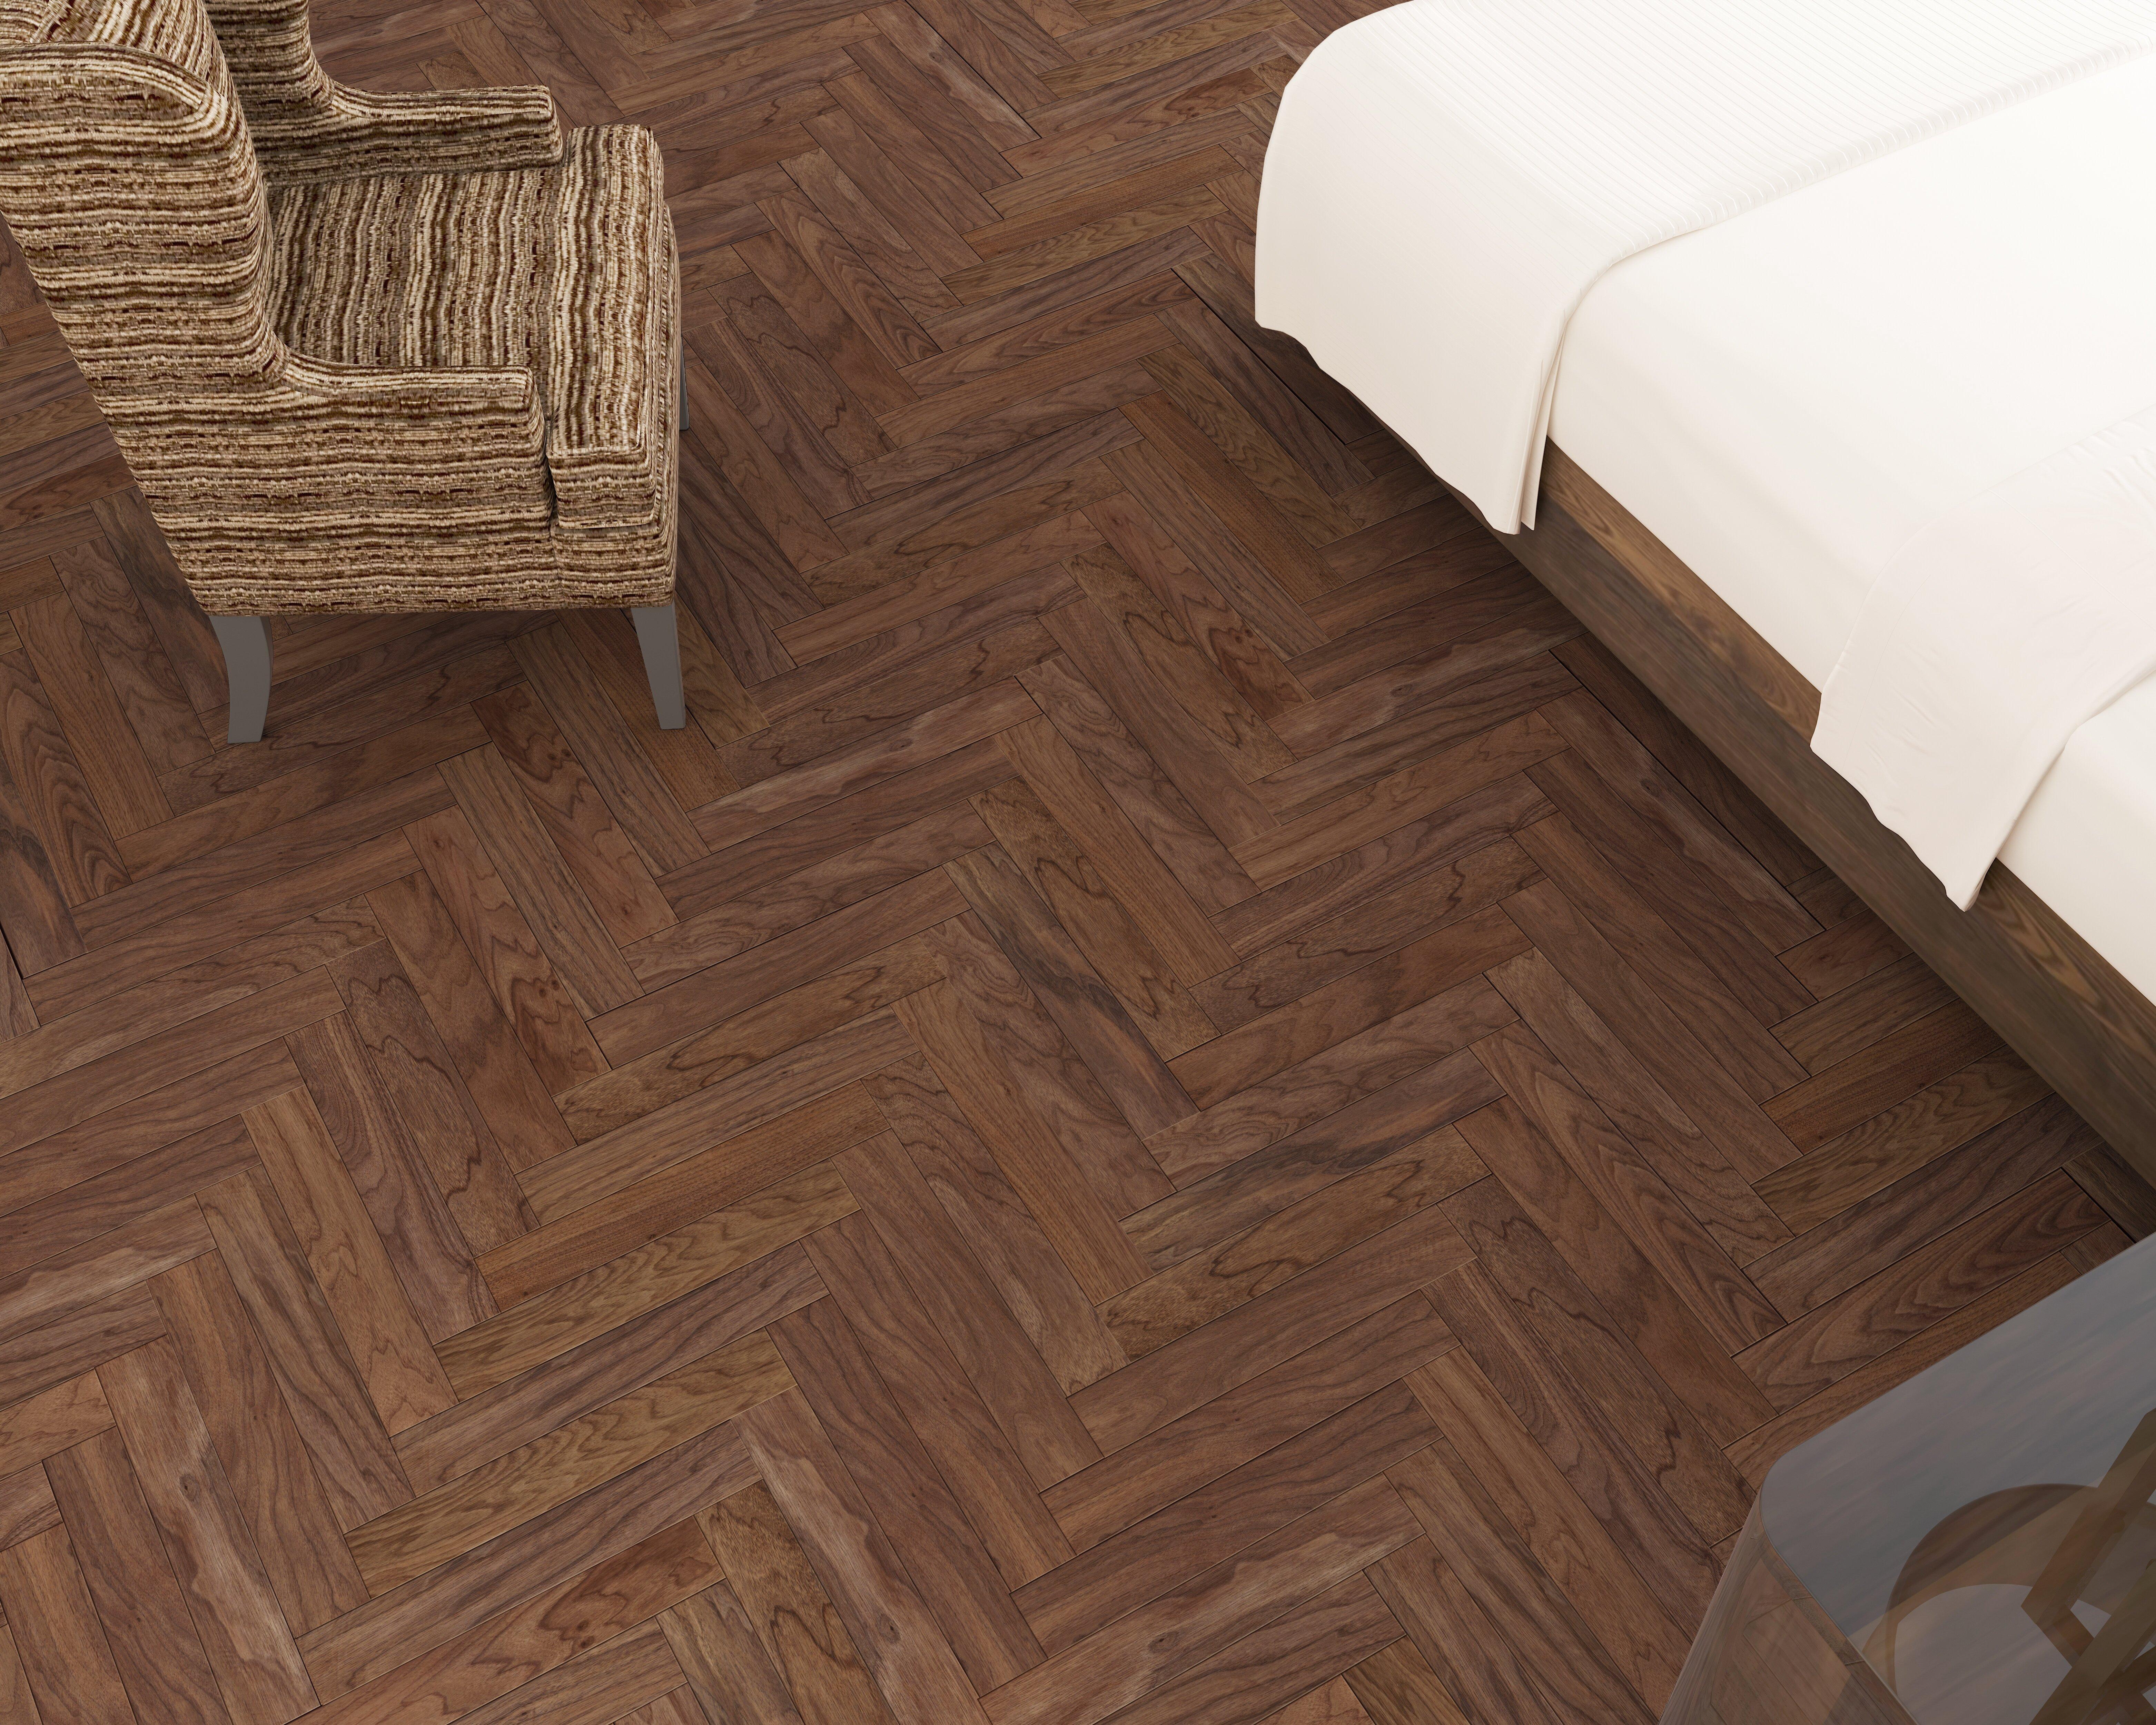 Solid Walnut Parquet Hardwood Flooring